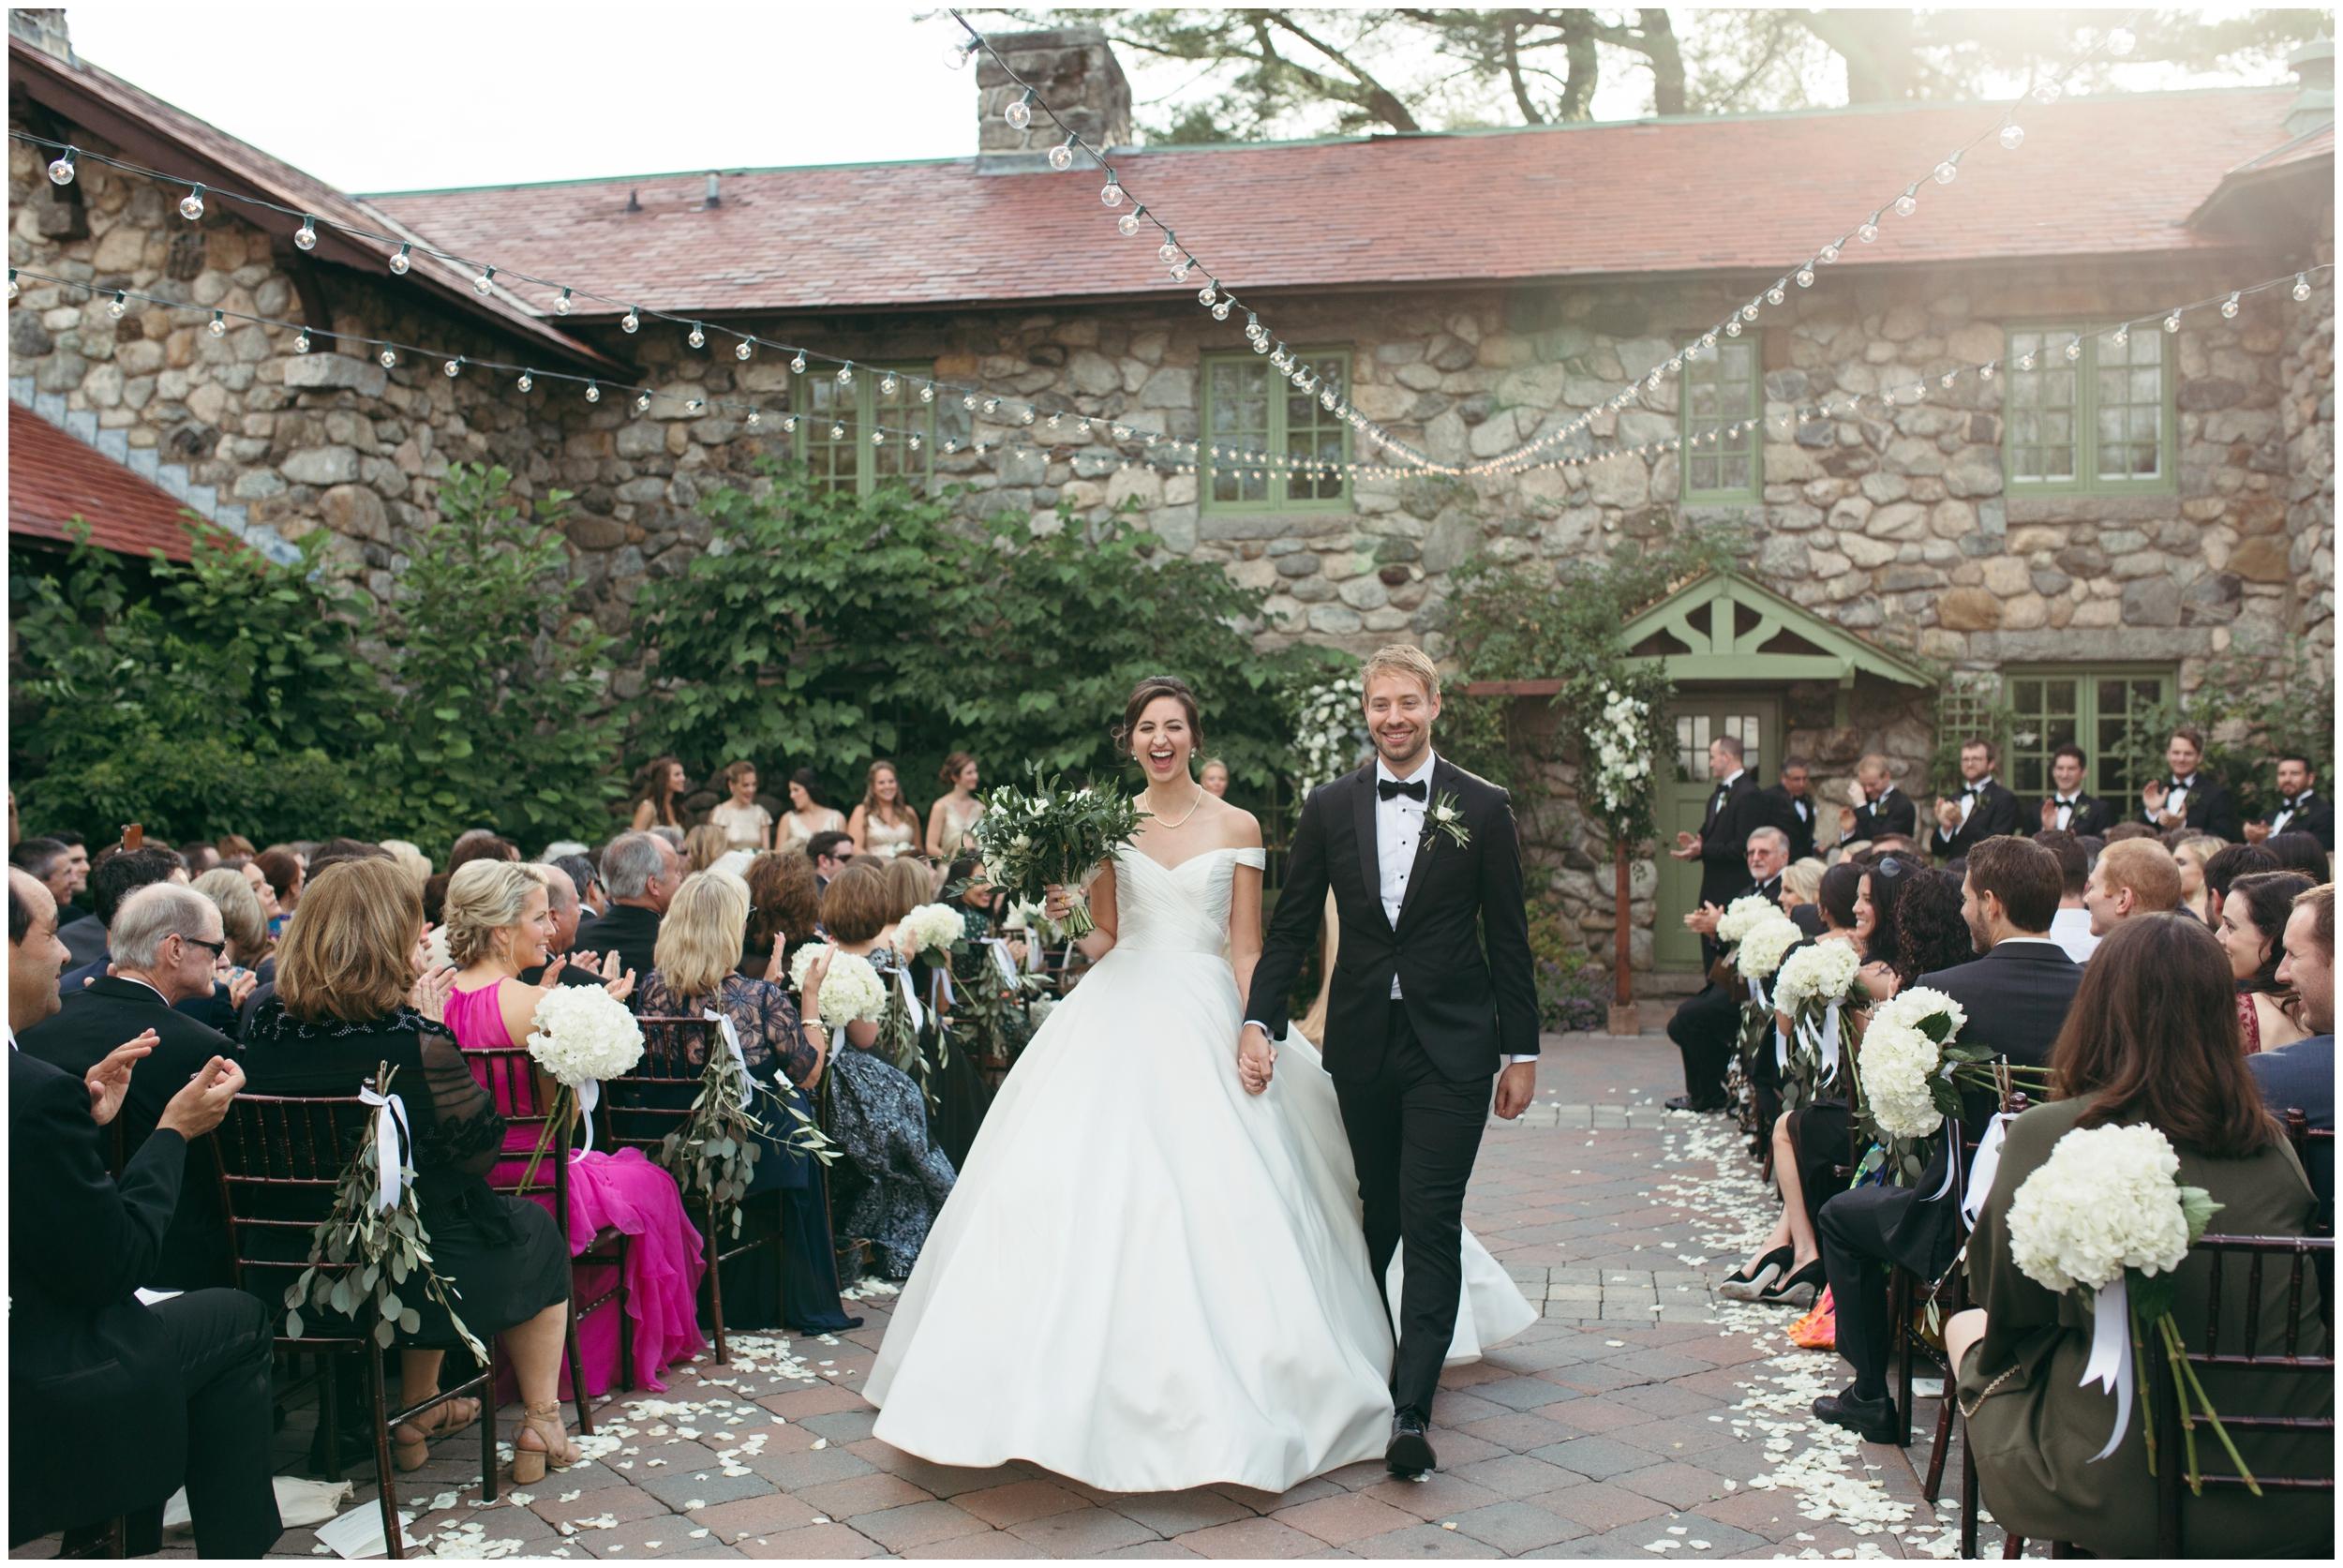 Willowdale-Estate-Wedding-Bailey-Q-Photo-Boston-Wedding-Photographer-046.JPG